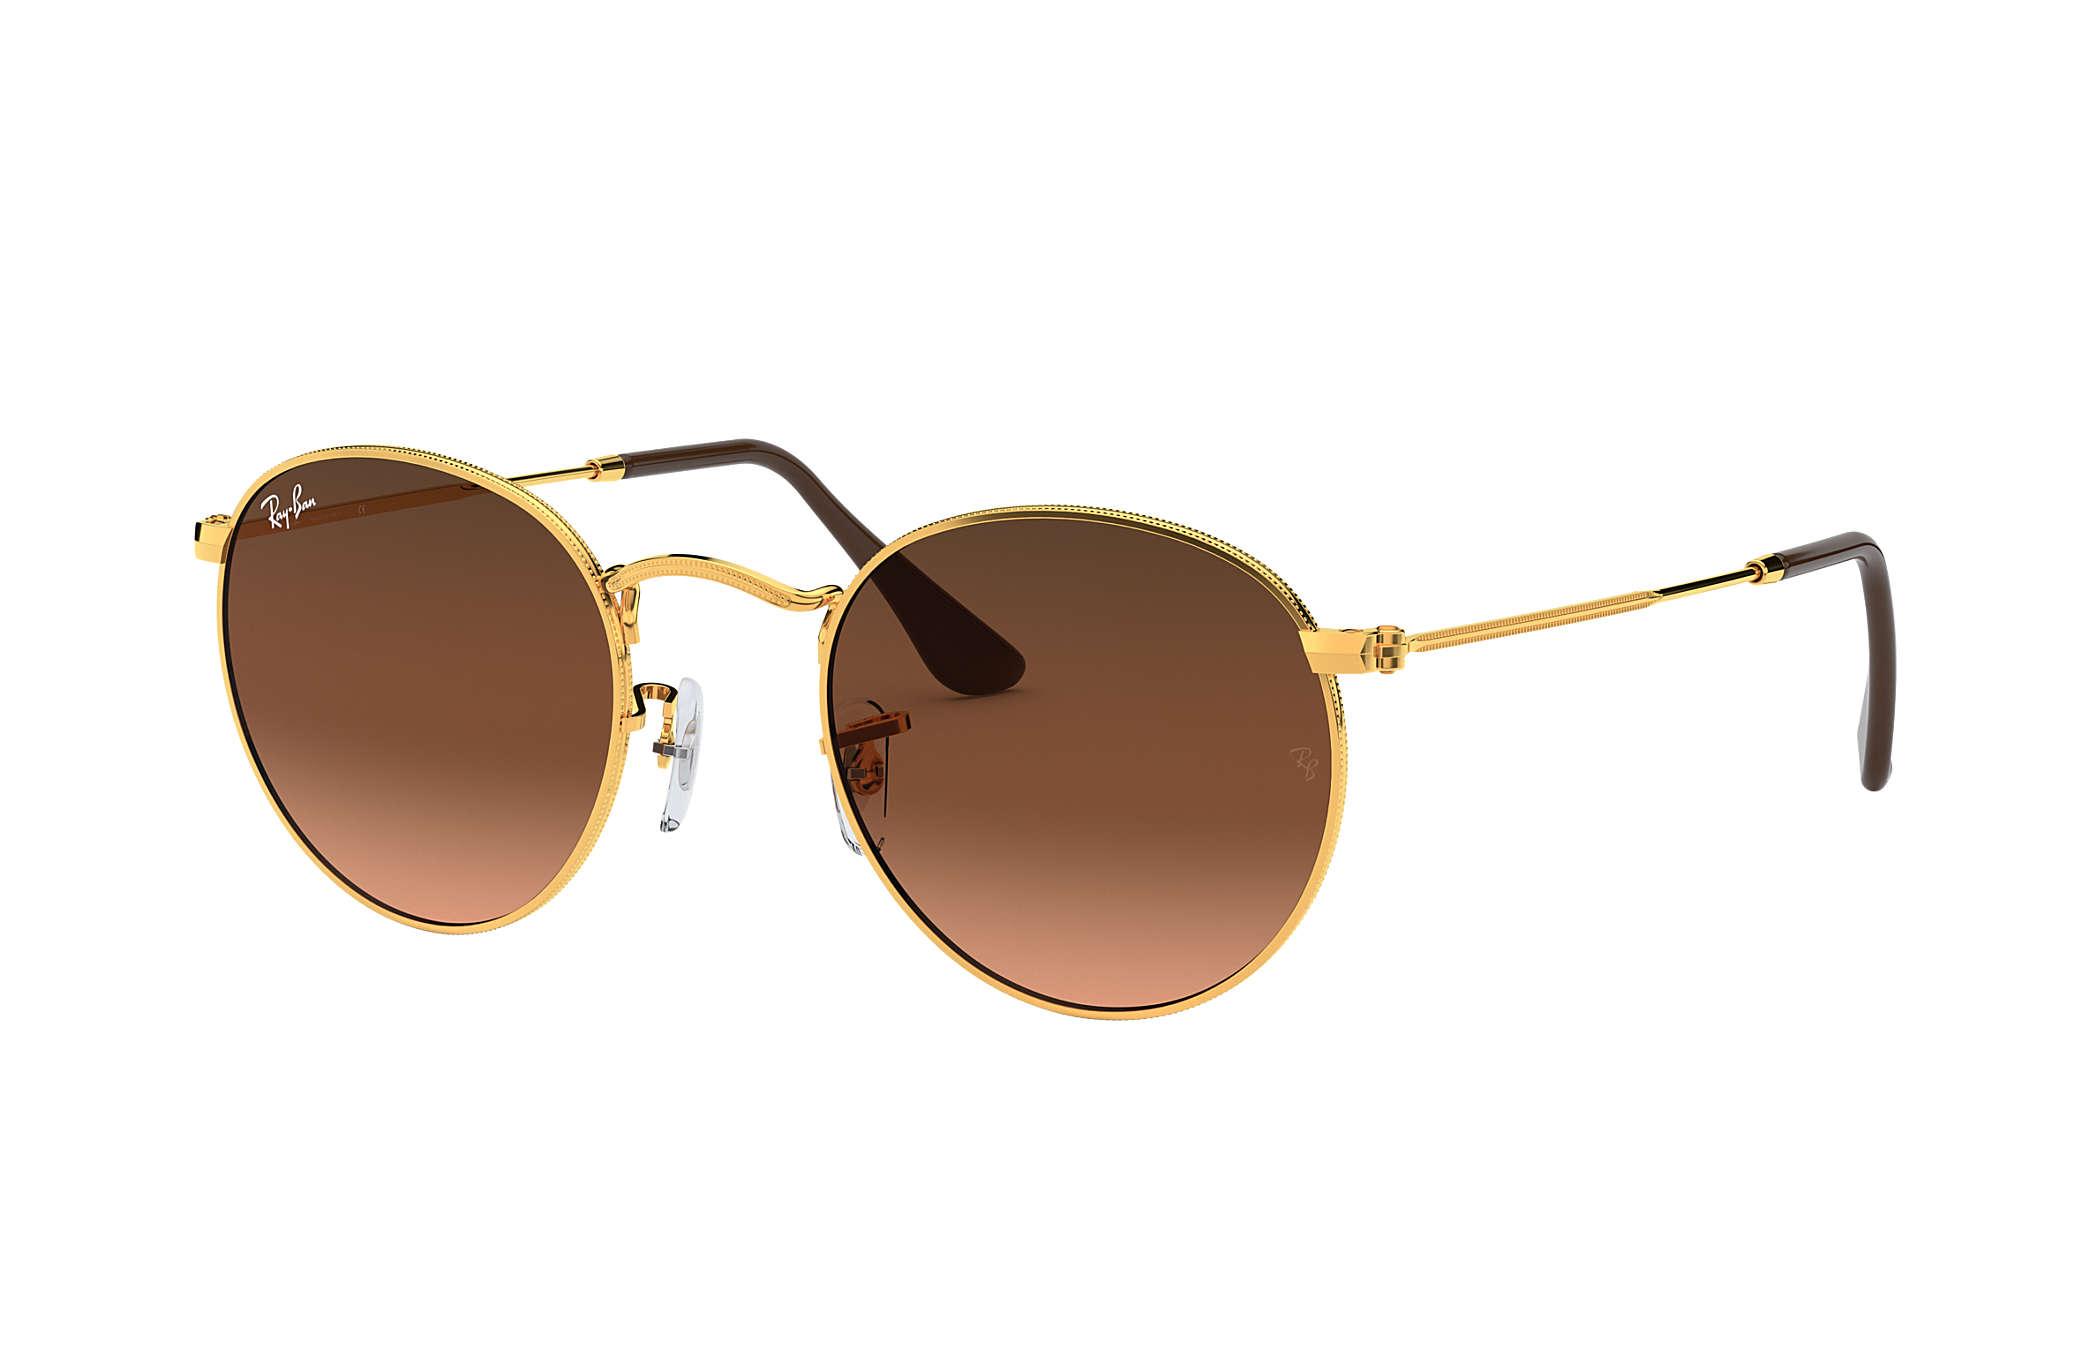 3ba3dc72bea85c Ray-Ban Round Metal RB3447 Bronze-Copper - Metal - Pink Brown Lenses ...